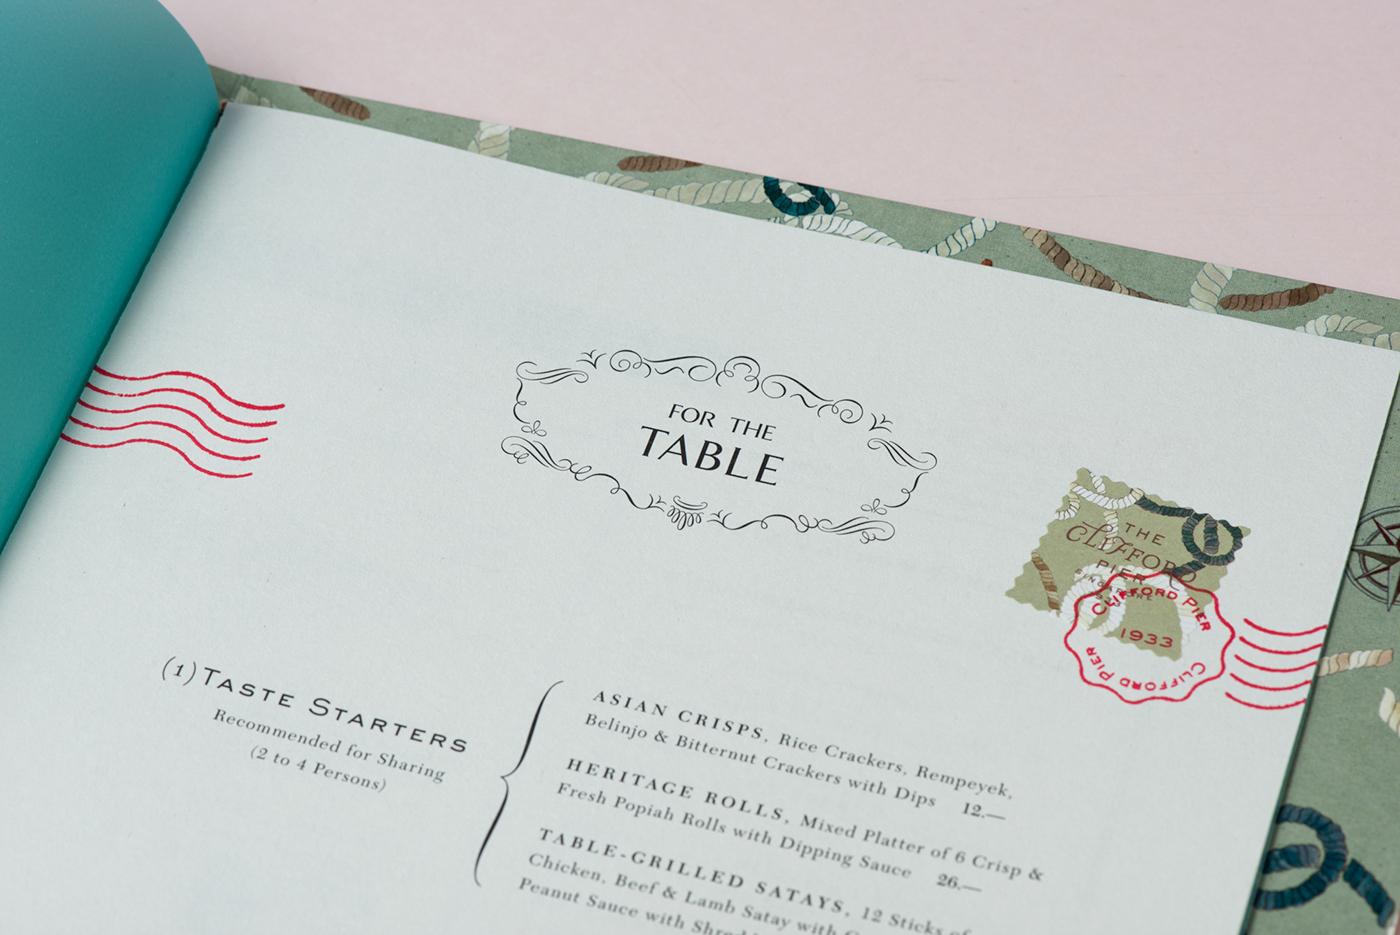 restaurant menu design Hospitality singapore foreign policy botanticals illustrations colonial